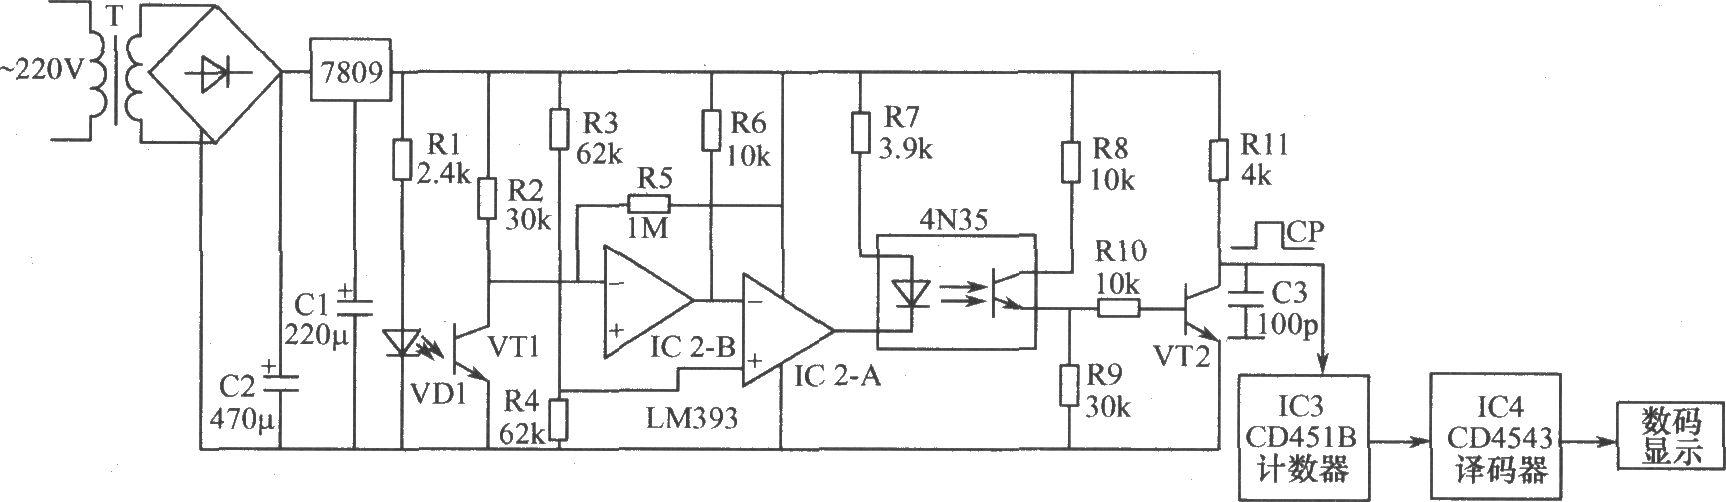 4N35内的发光管点亮,对应的光敏管导通,三极管VT2也导通,VT2集电极输出低电平。当有物体通过红外发光二极管VD1和接收管VT1之间,红外线被挡住,VT1截止,IC2-A的1脚输出高电平,4N35截止,VT2截止,VT2集电极输出高电平,故当有物体通过VT1时,便在VT2集电极上输出计数脉冲信号,该信号送到十进制计数器,再送到译码显示电路,显示出相应的数据。